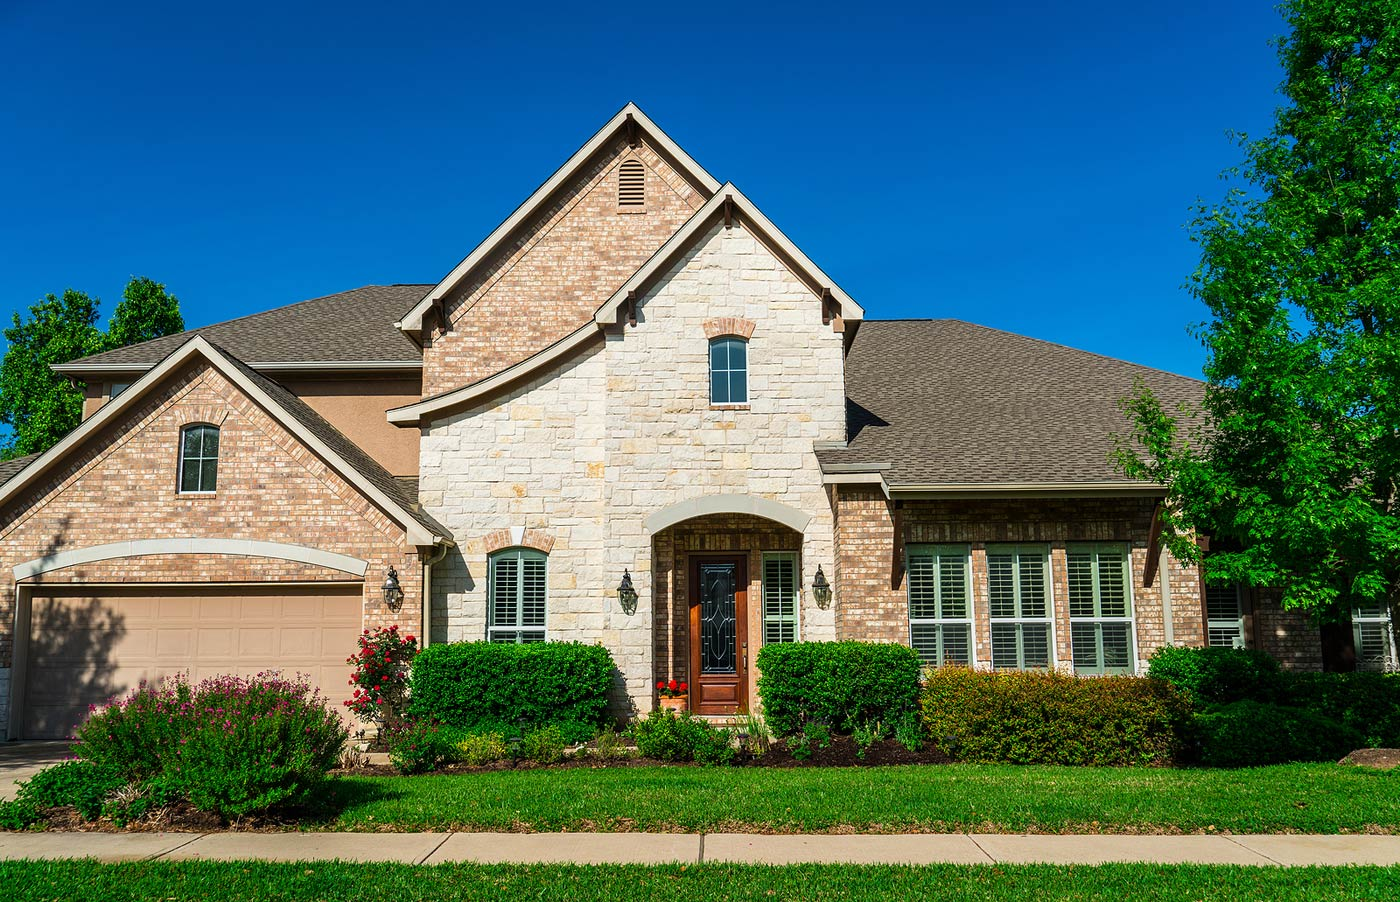 Conroe property management services